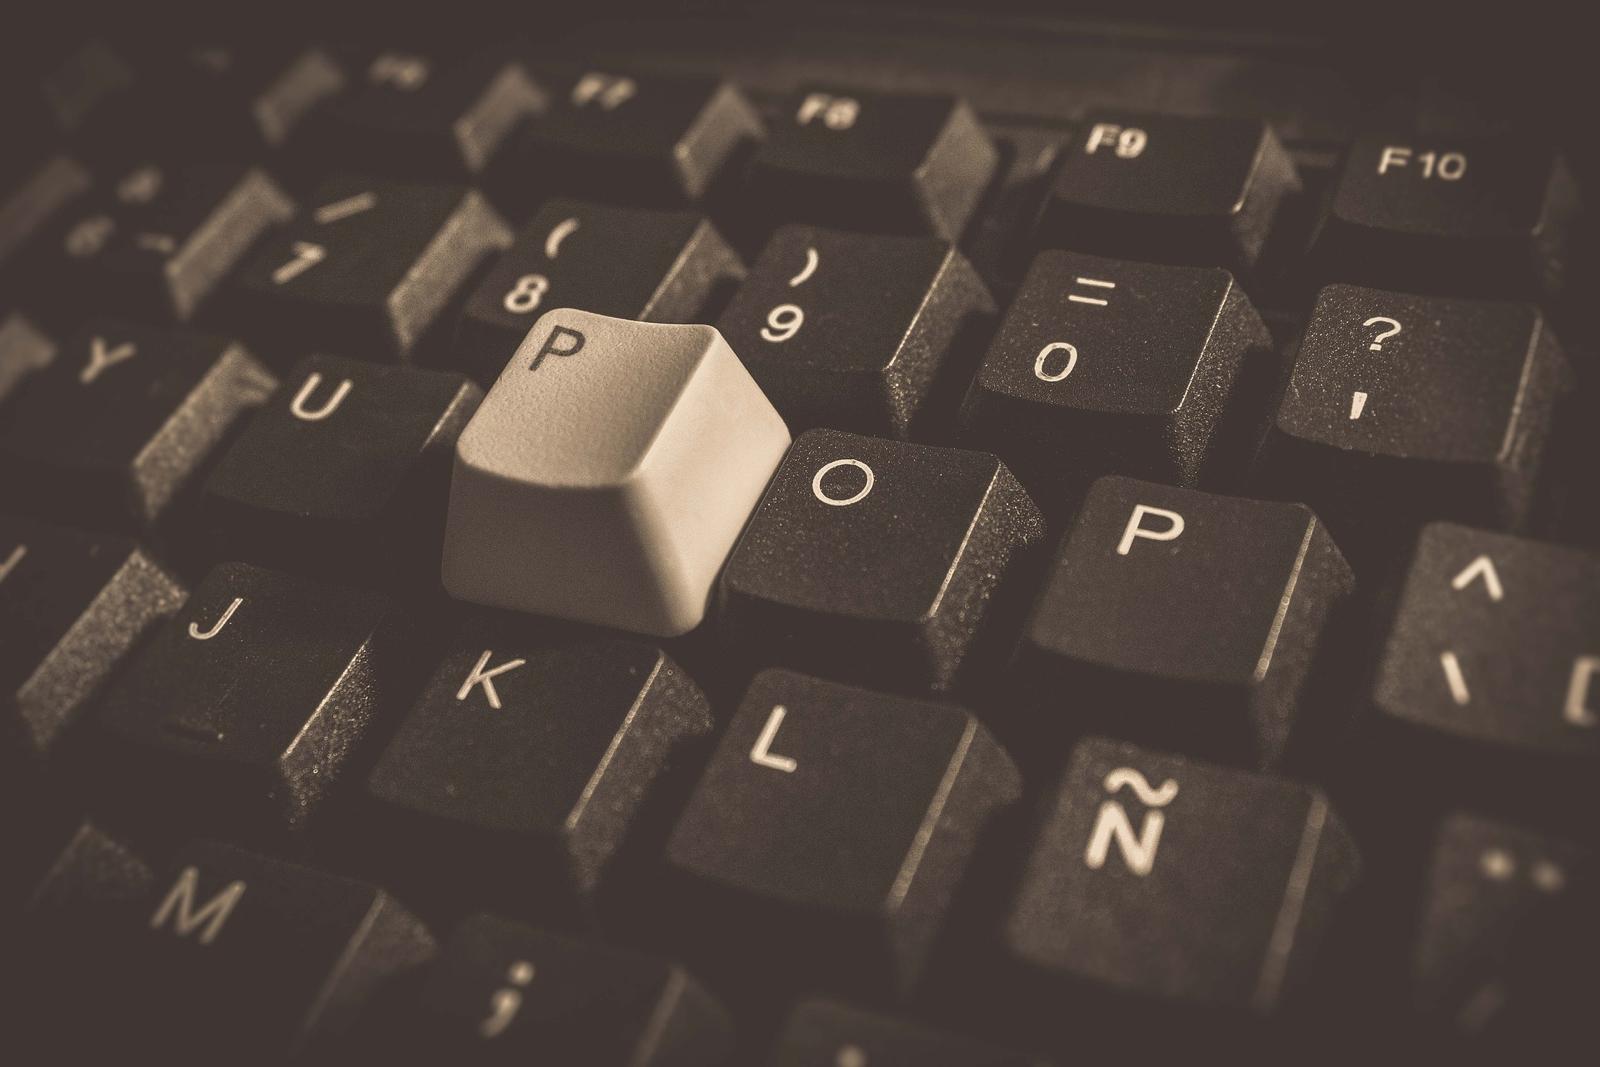 Stock image of keyboard. Conexant keylogger notwithstanding.